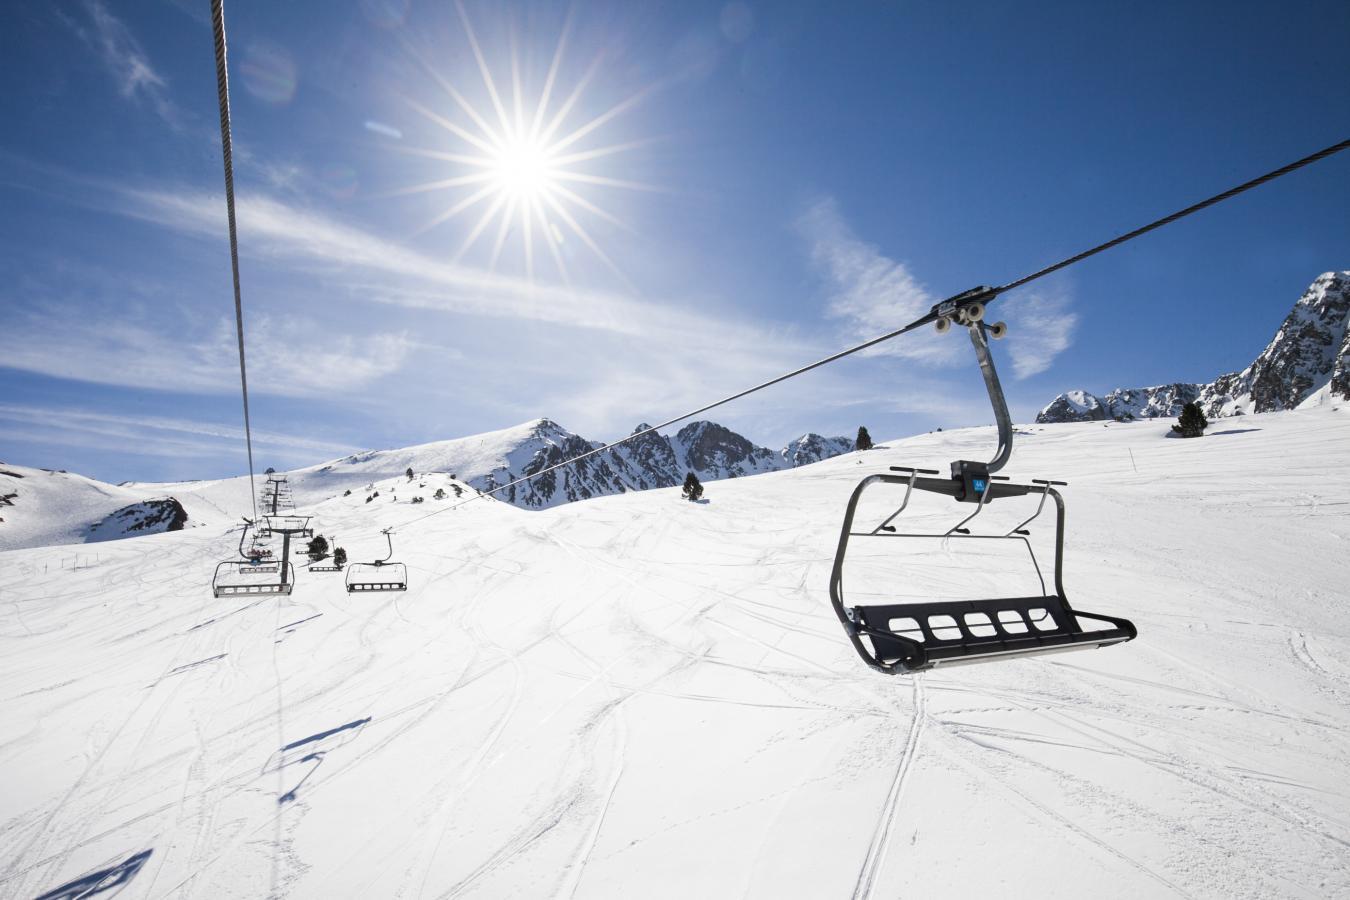 Nouveautés hiver 2018 à Grandvalira en Andorre